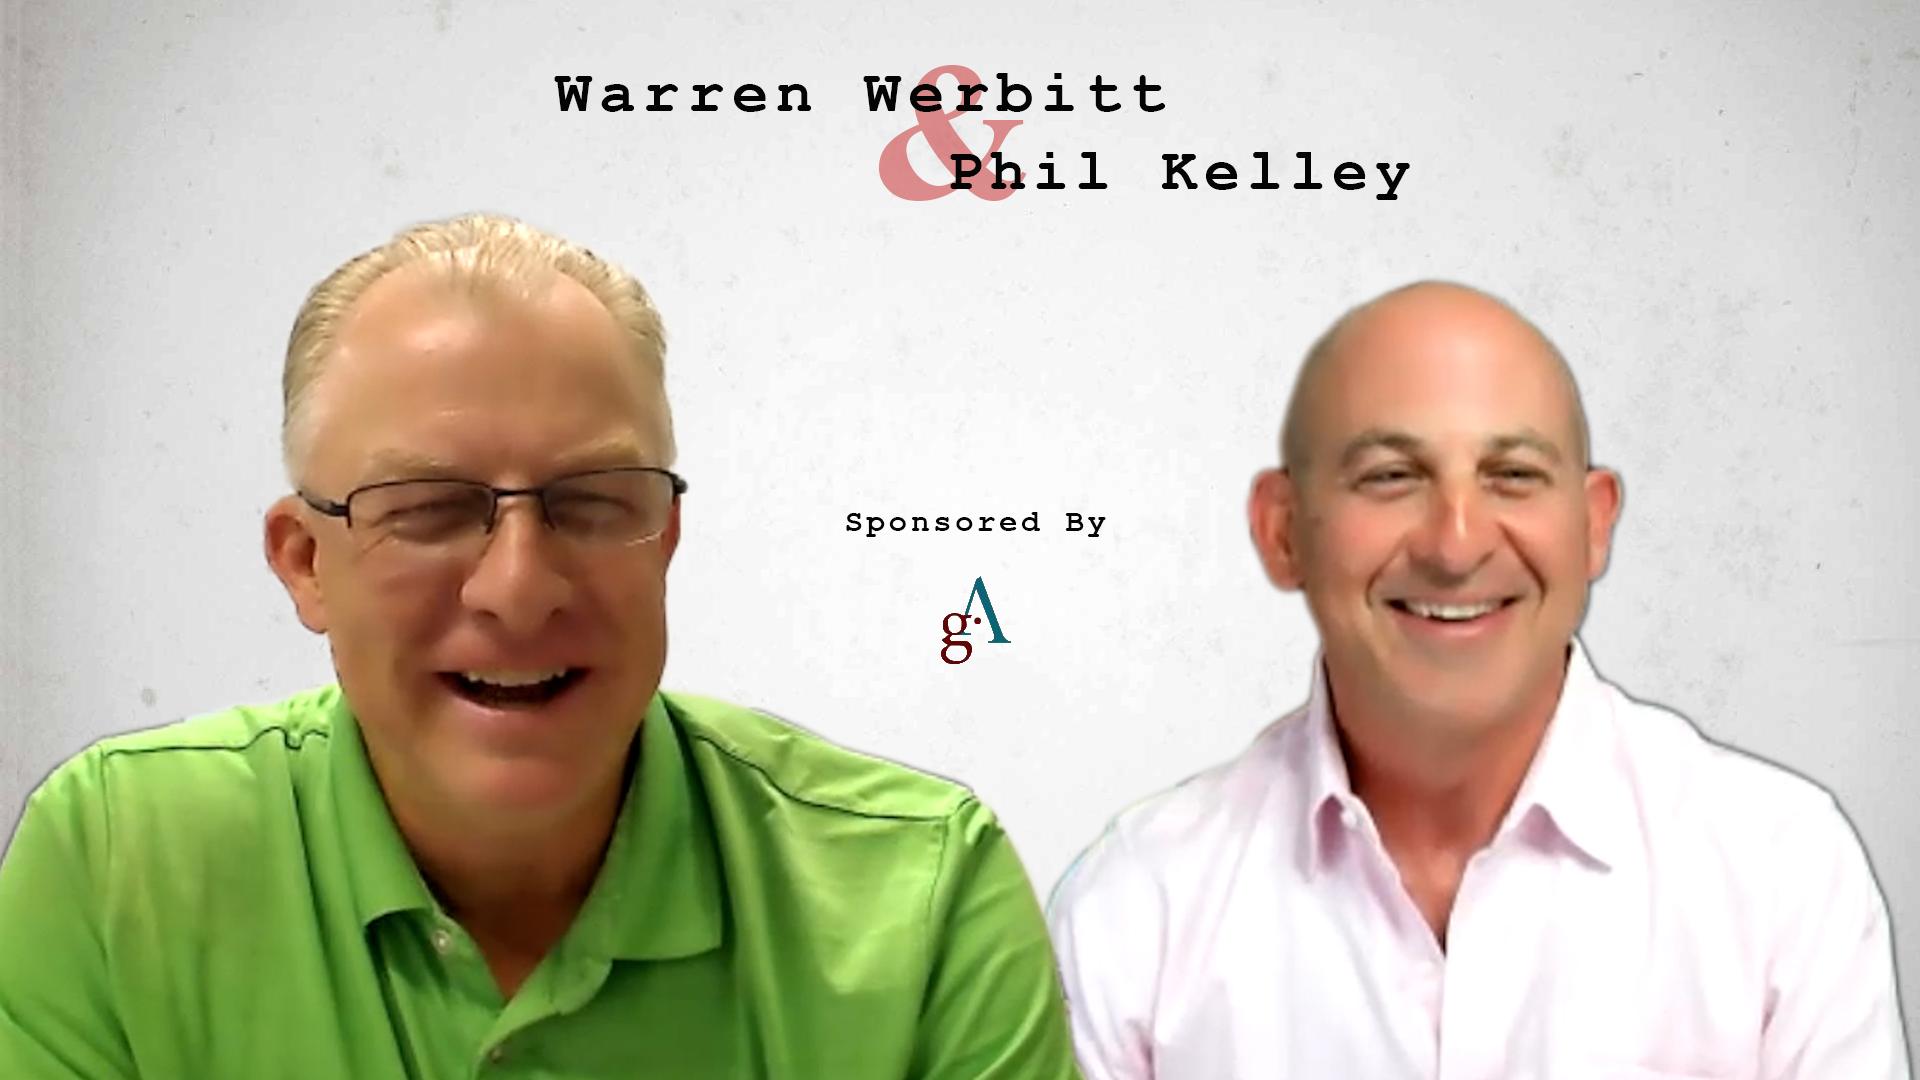 Video preview: Warren Werbitt Goes Printer to Printer with Salem One's Phil Kelley